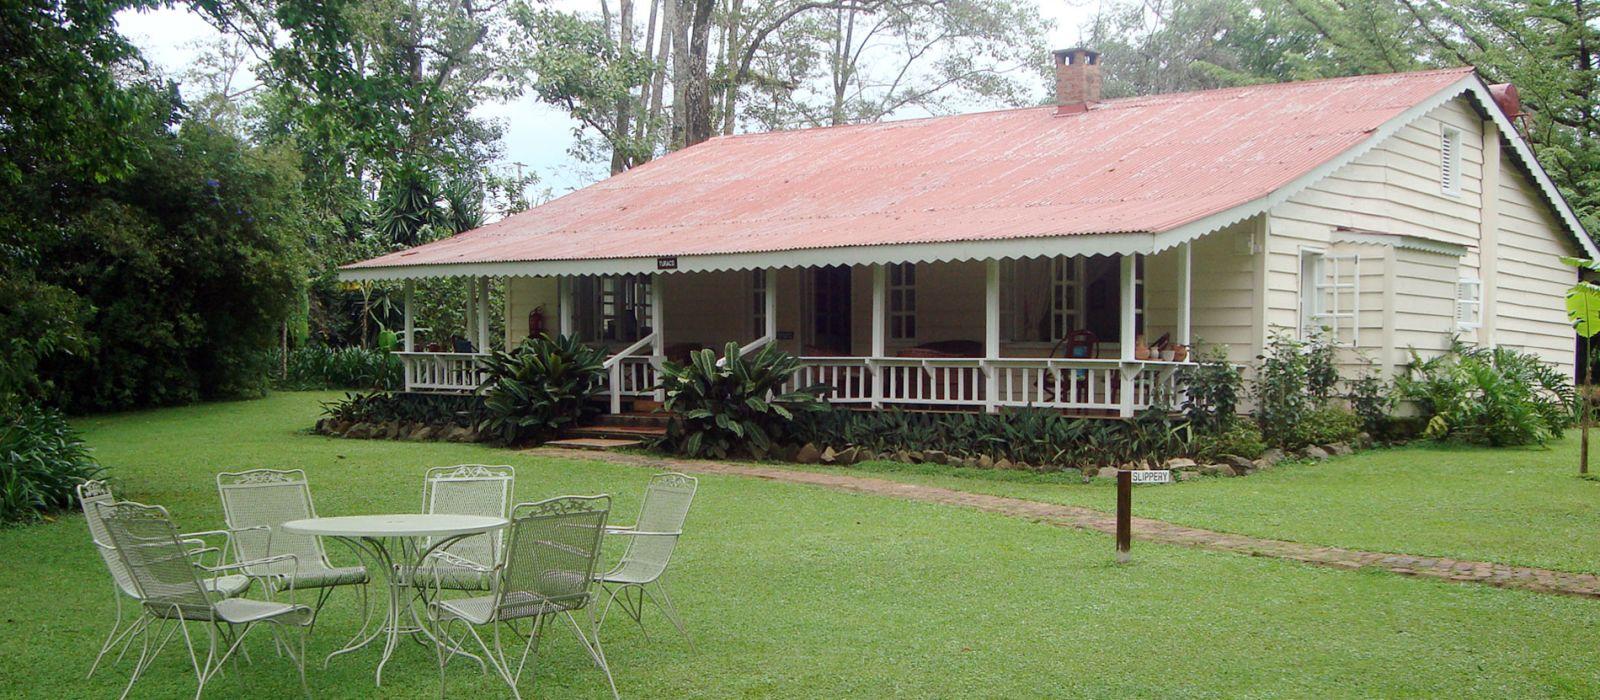 Hotel Rondo Retreat Kenia